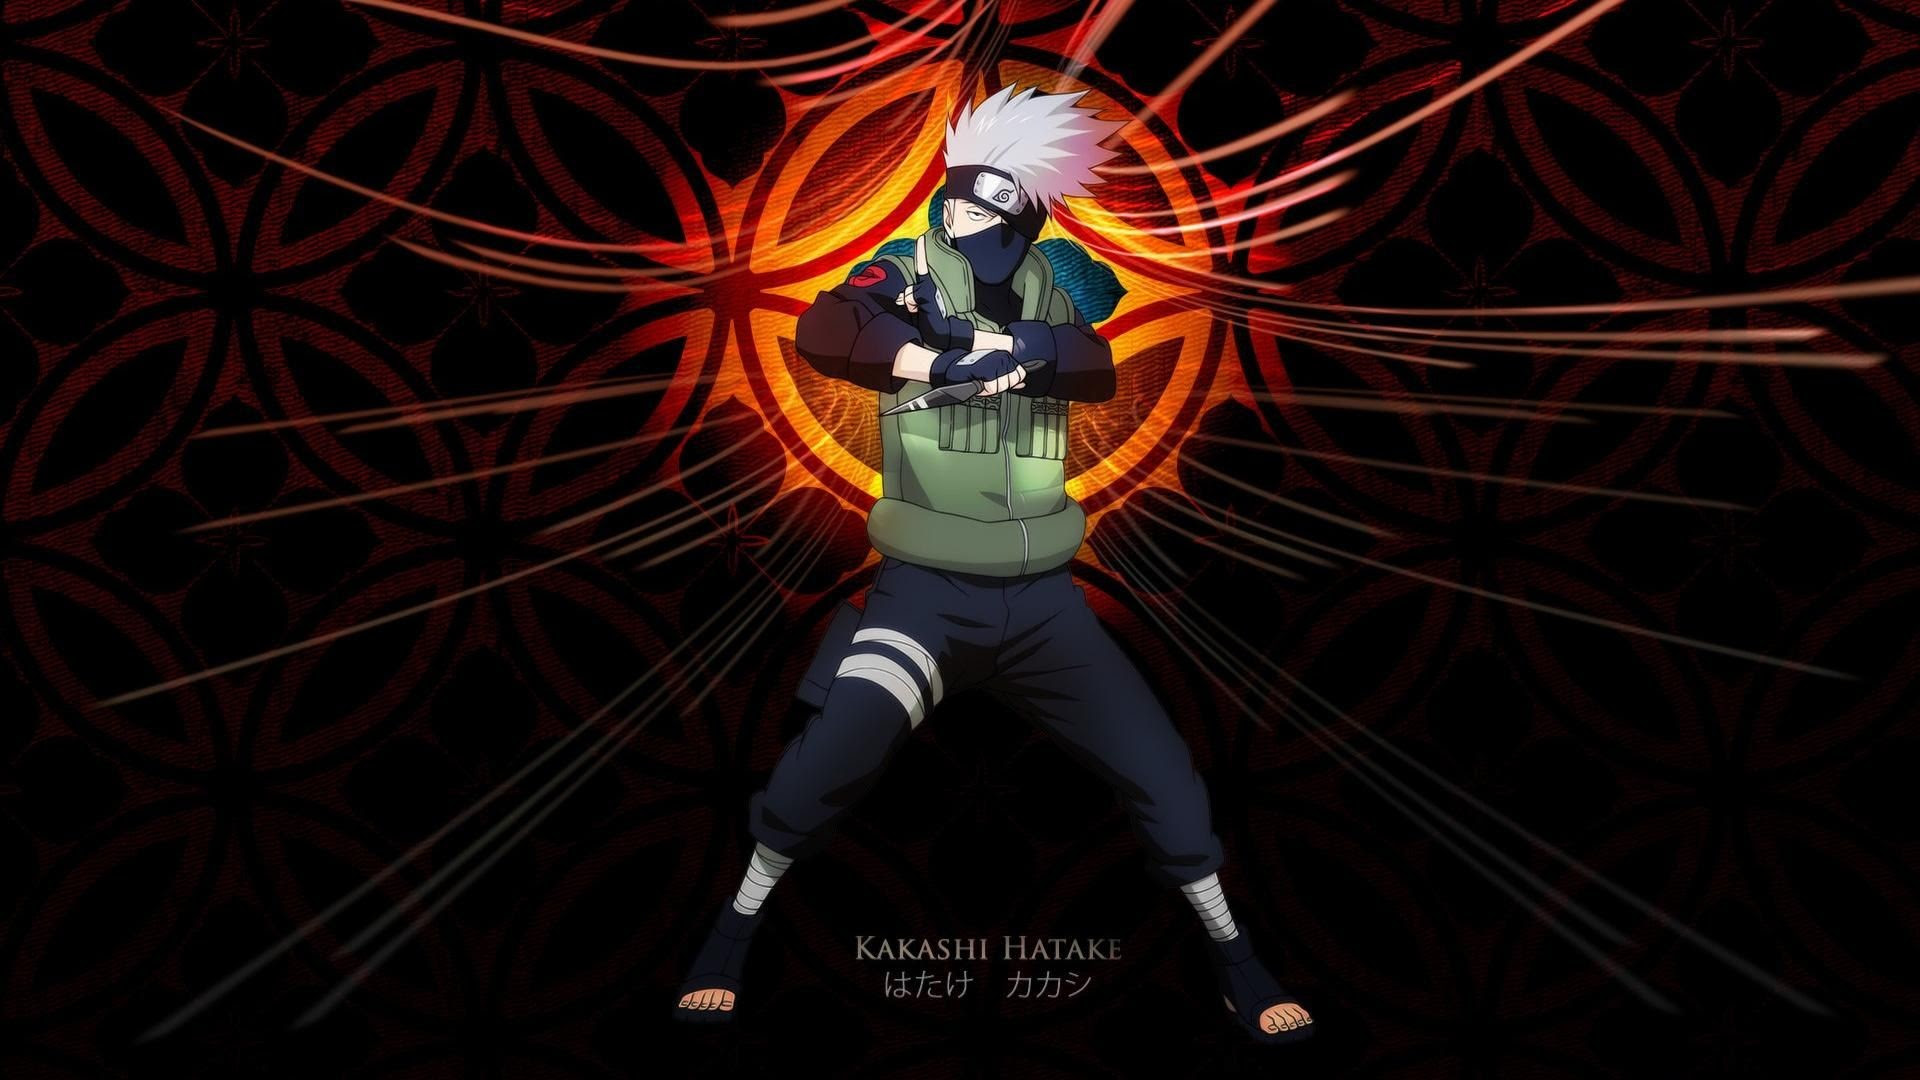 67 Gambar Keren Naruto Full Hd HD